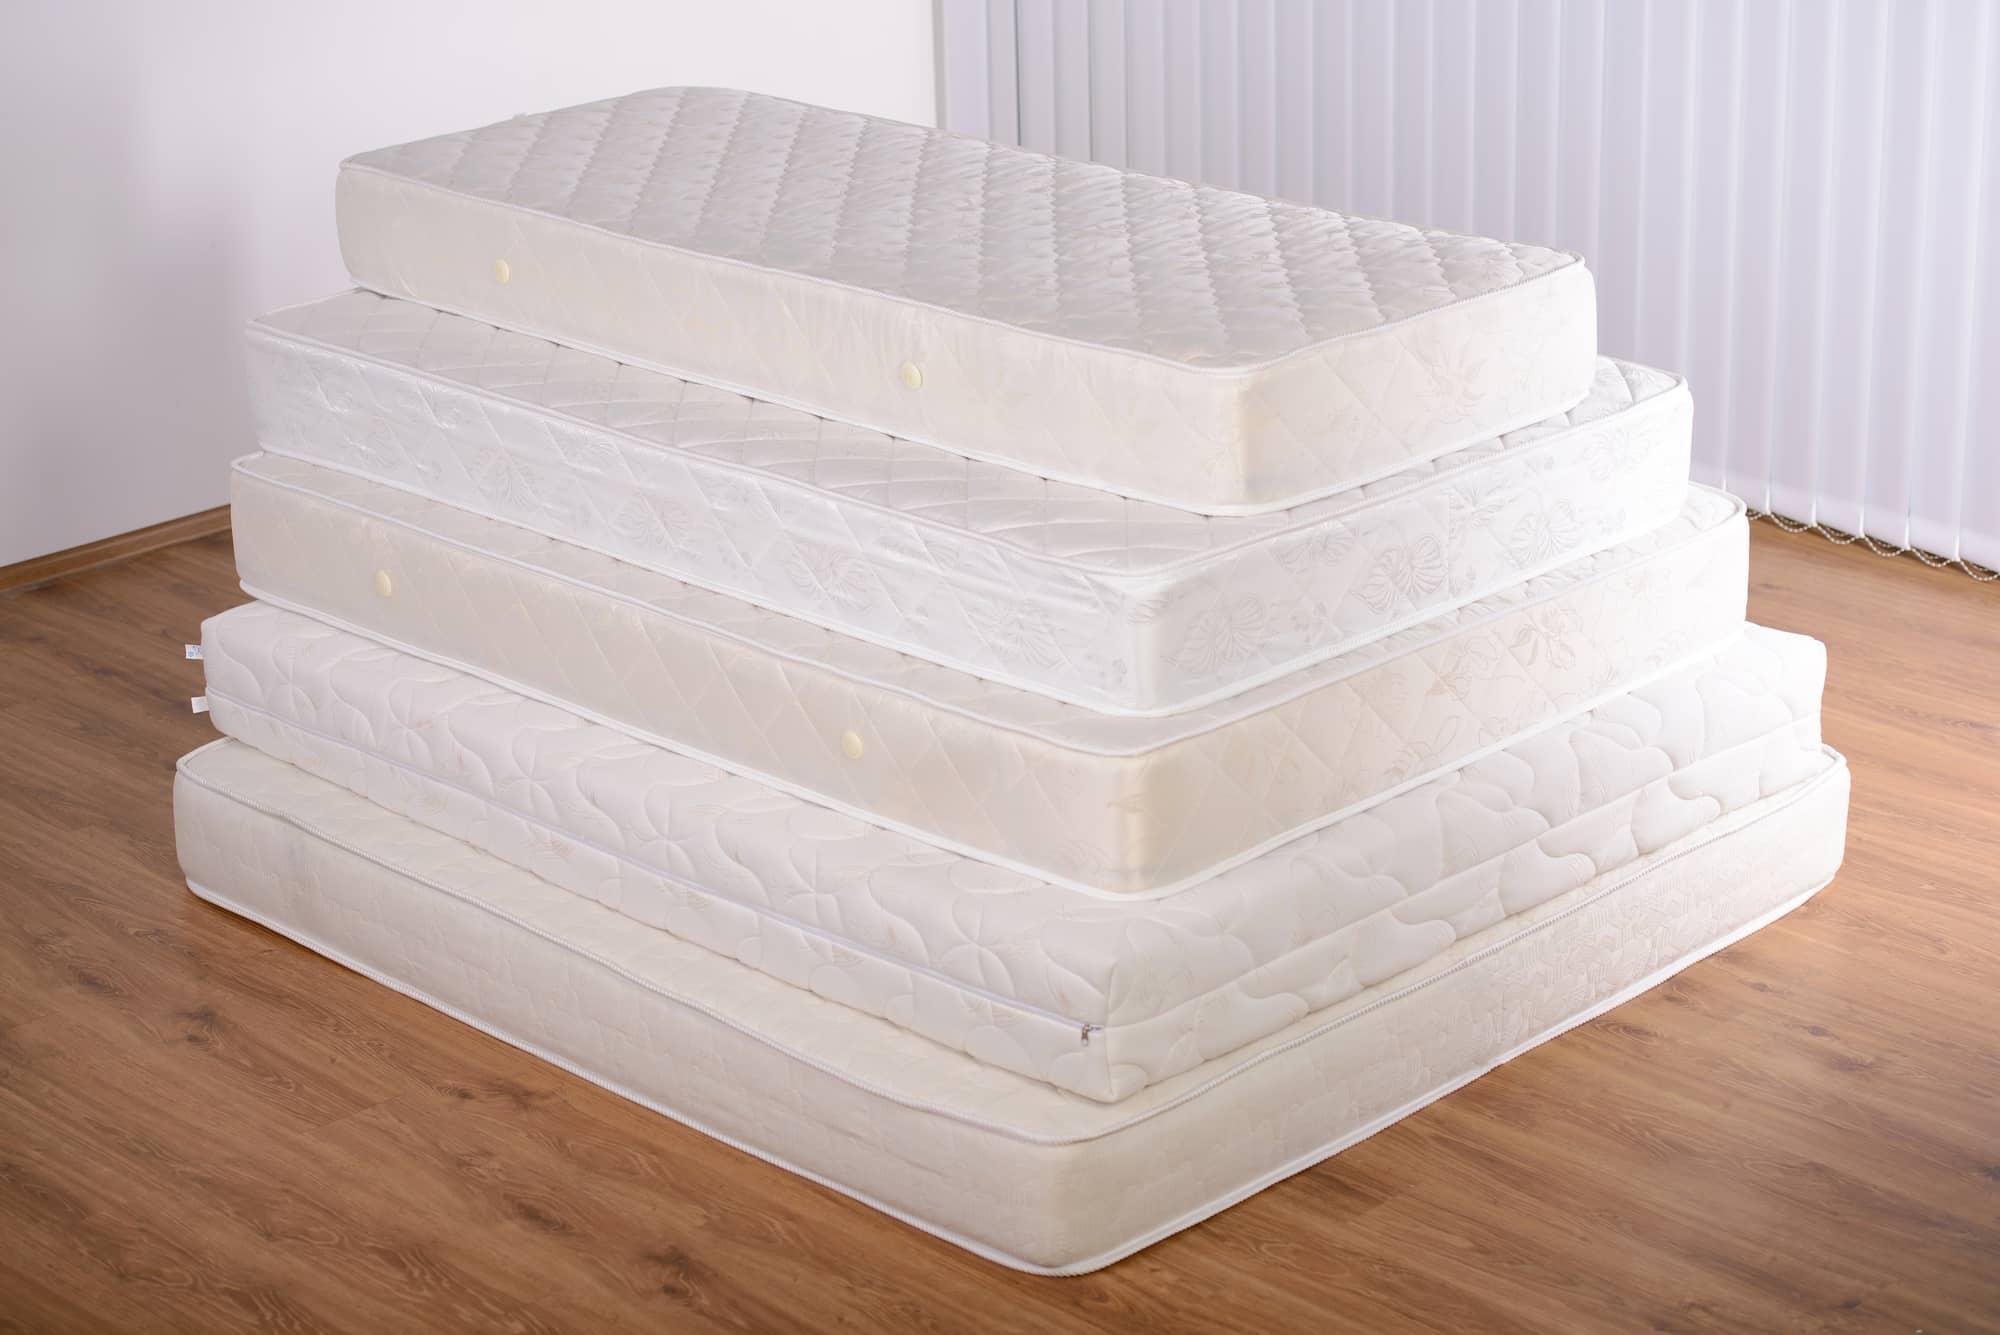 Types of mattresses